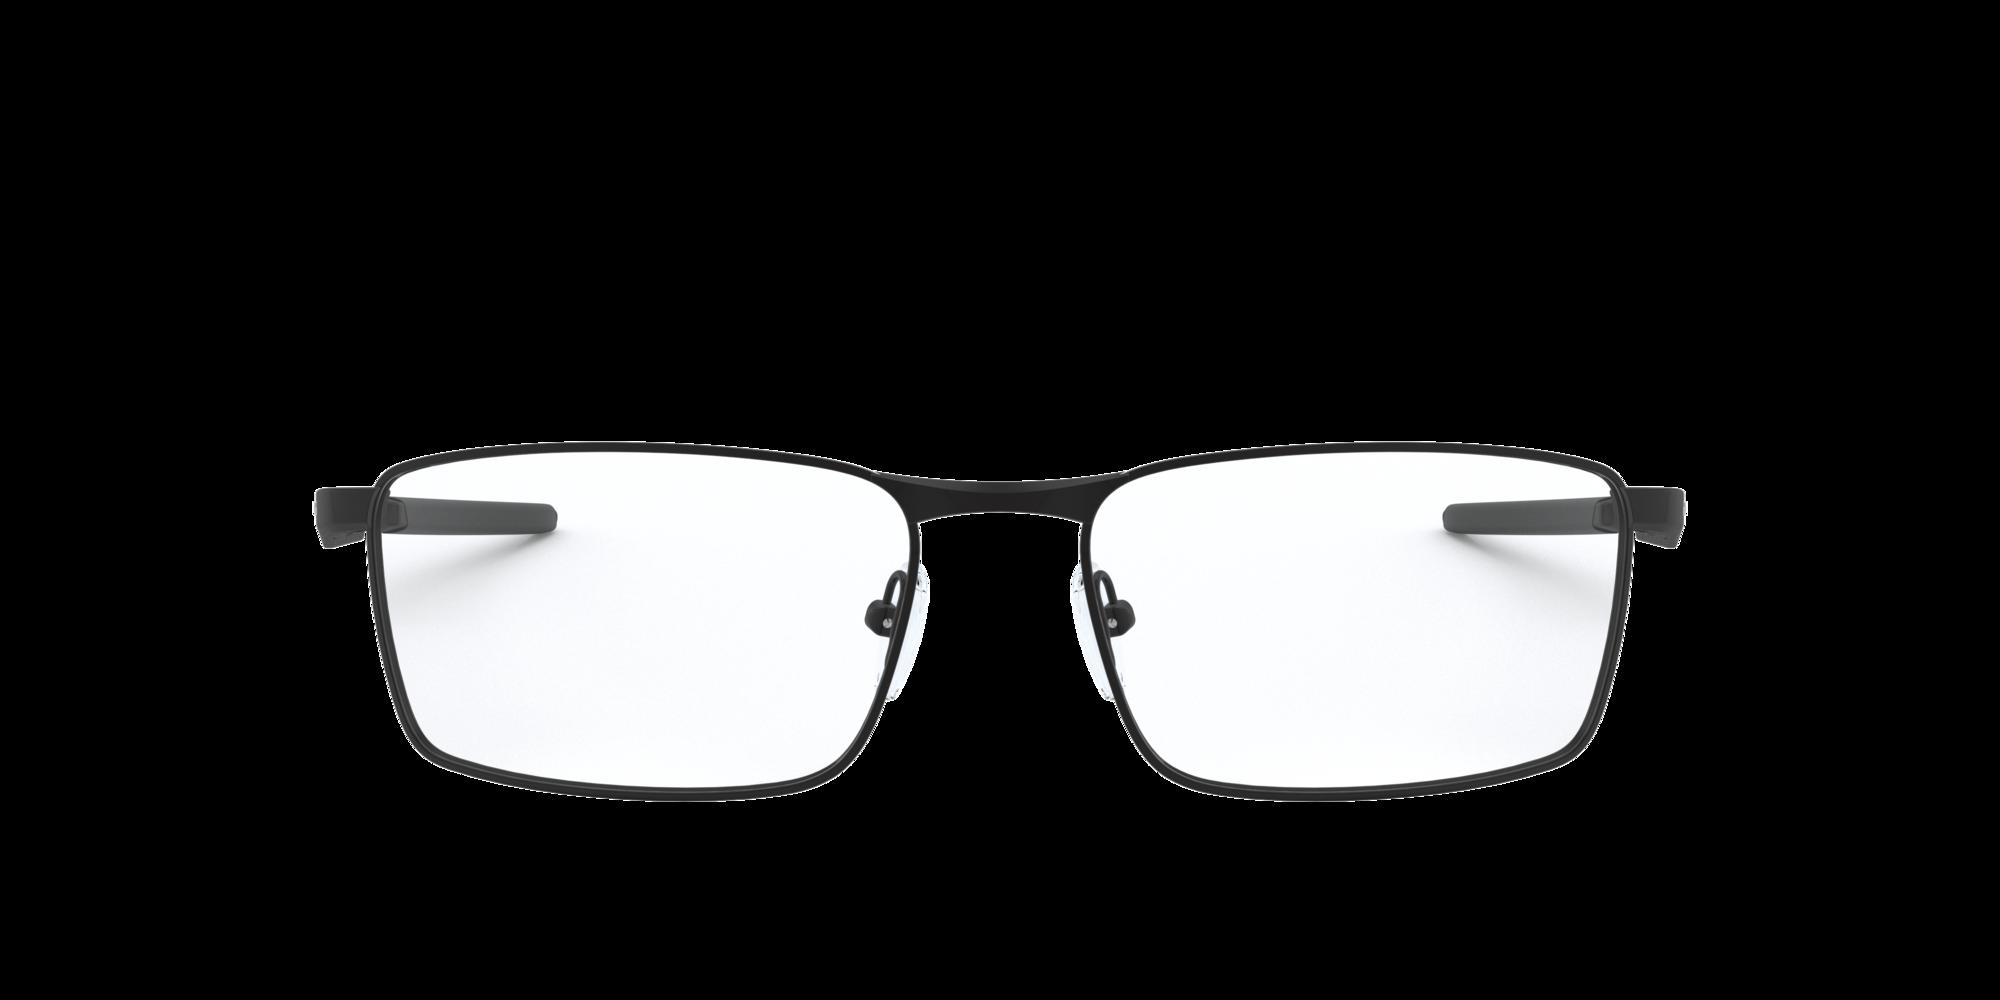 Image for OX3227 FULLER from LensCrafters   Glasses, Prescription Glasses Online, Eyewear